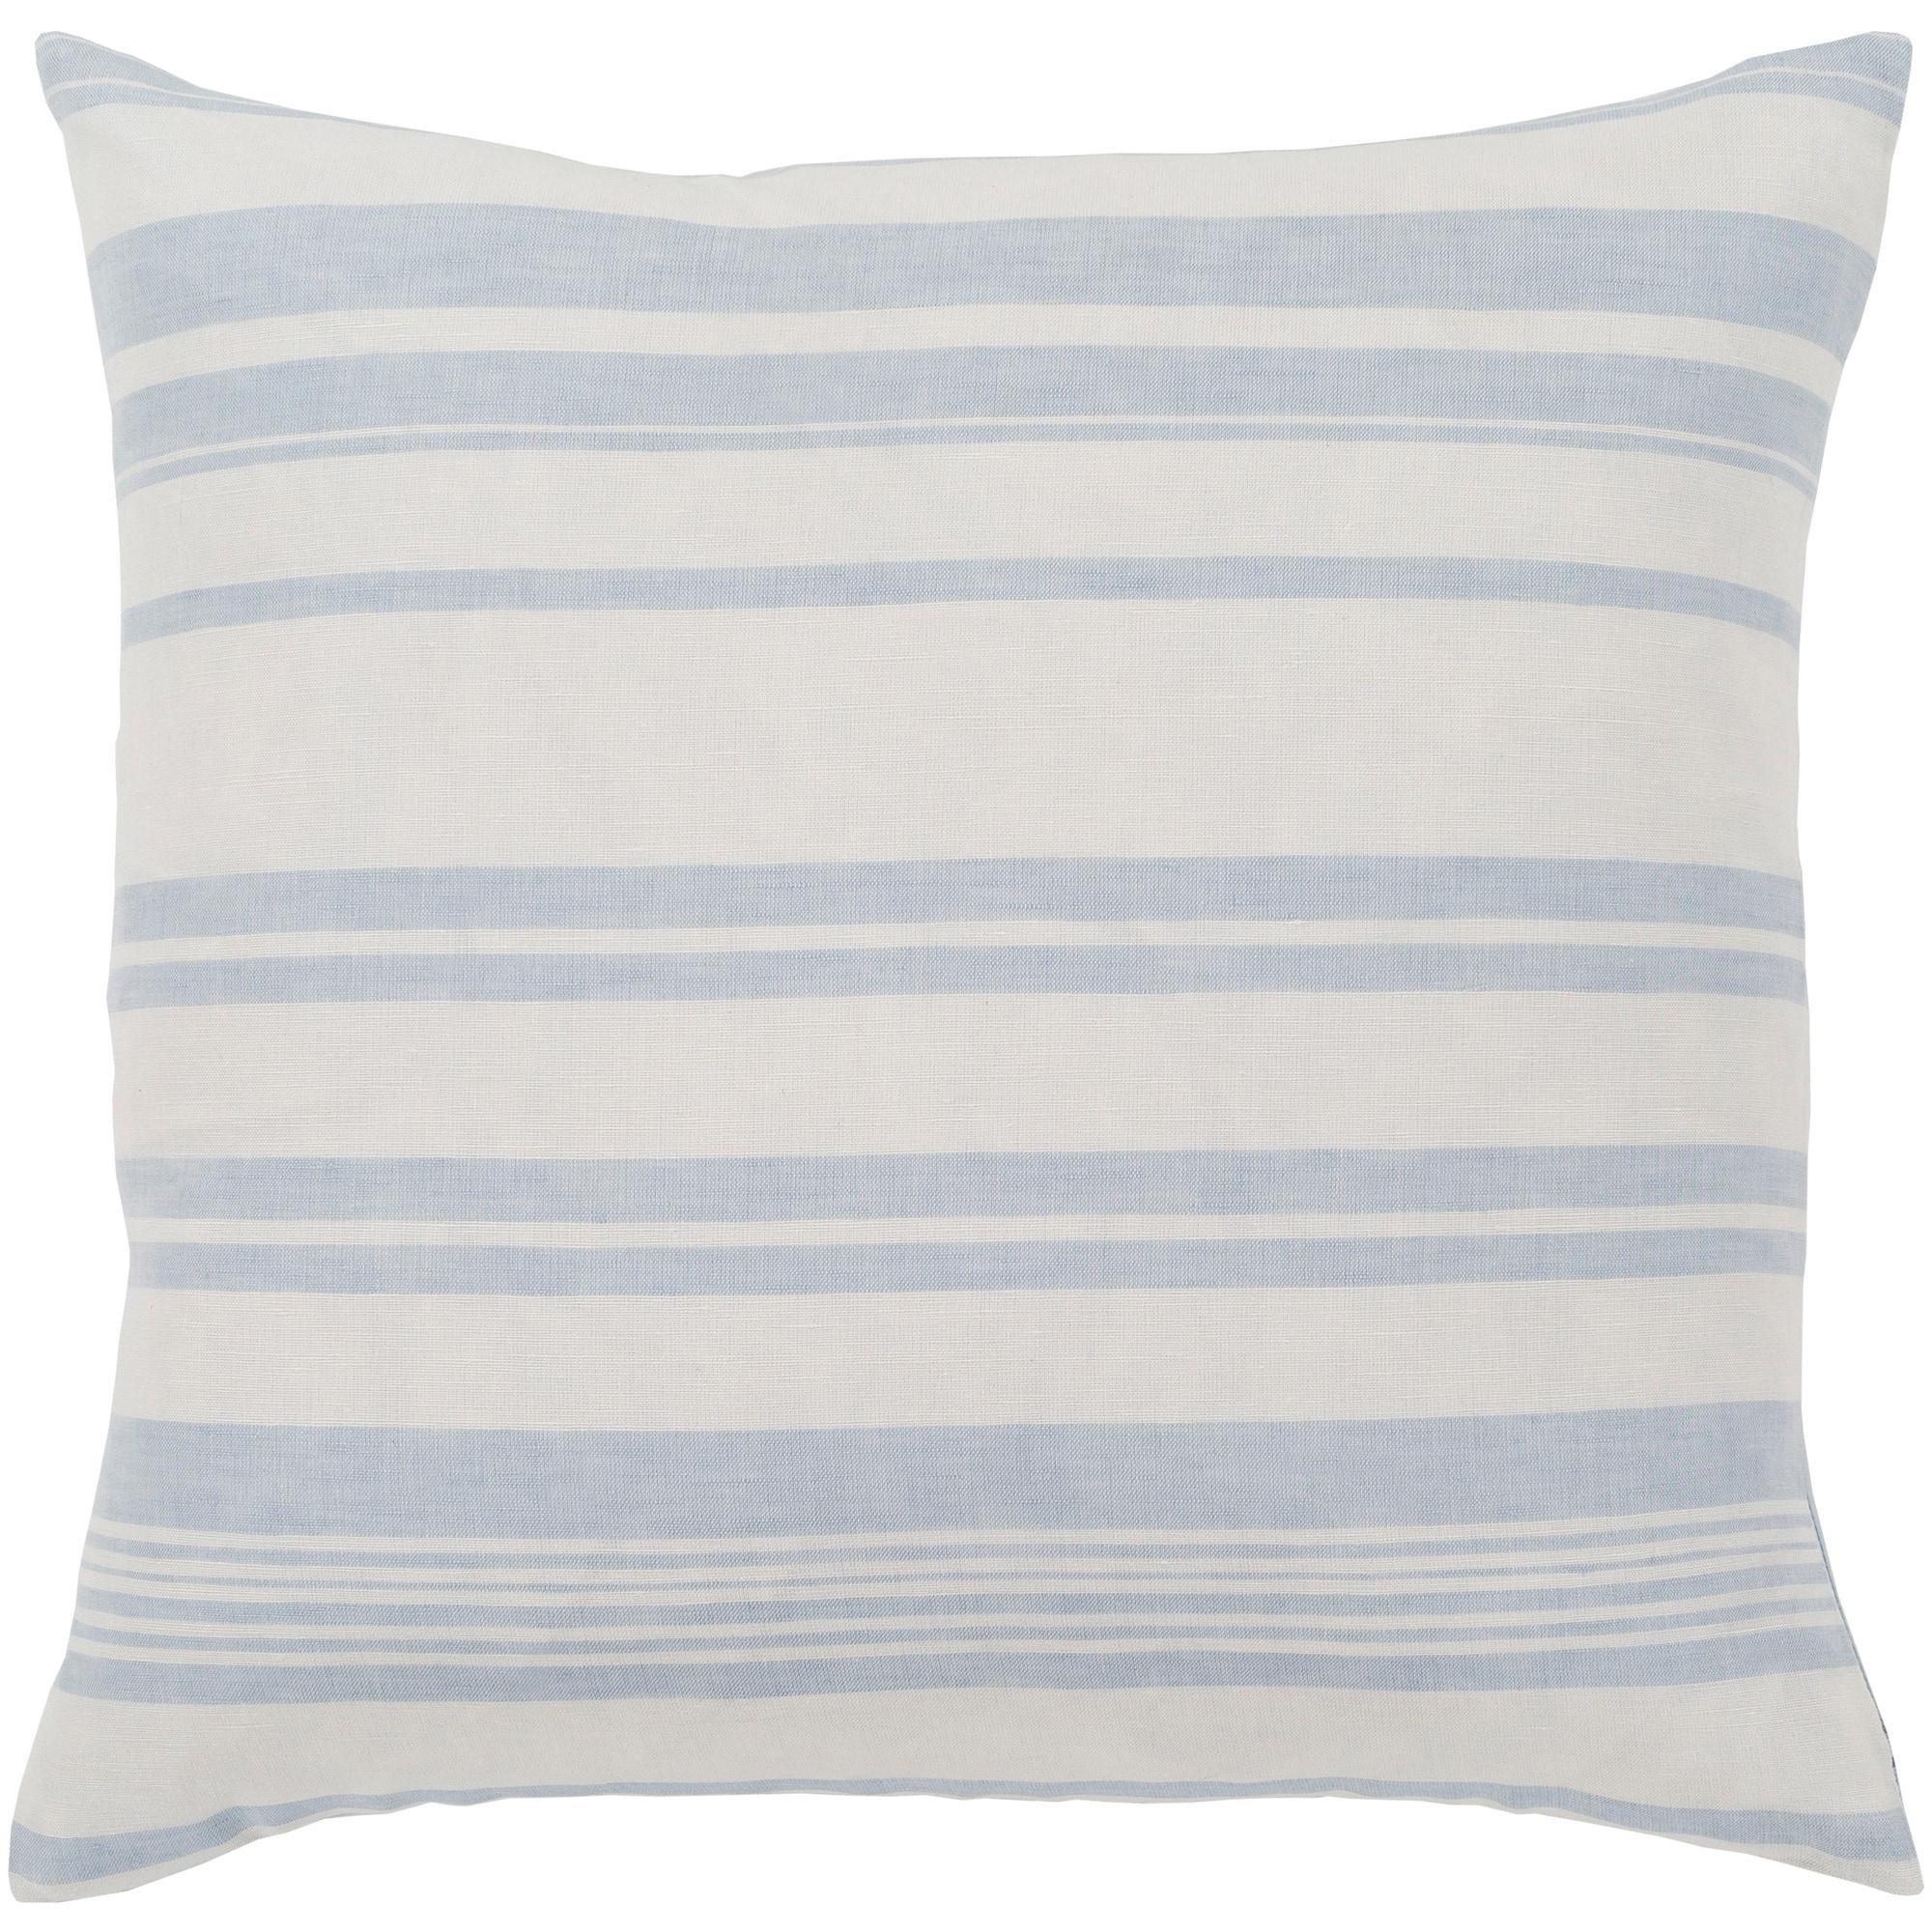 Blue White Striped Throw Pillow Cover